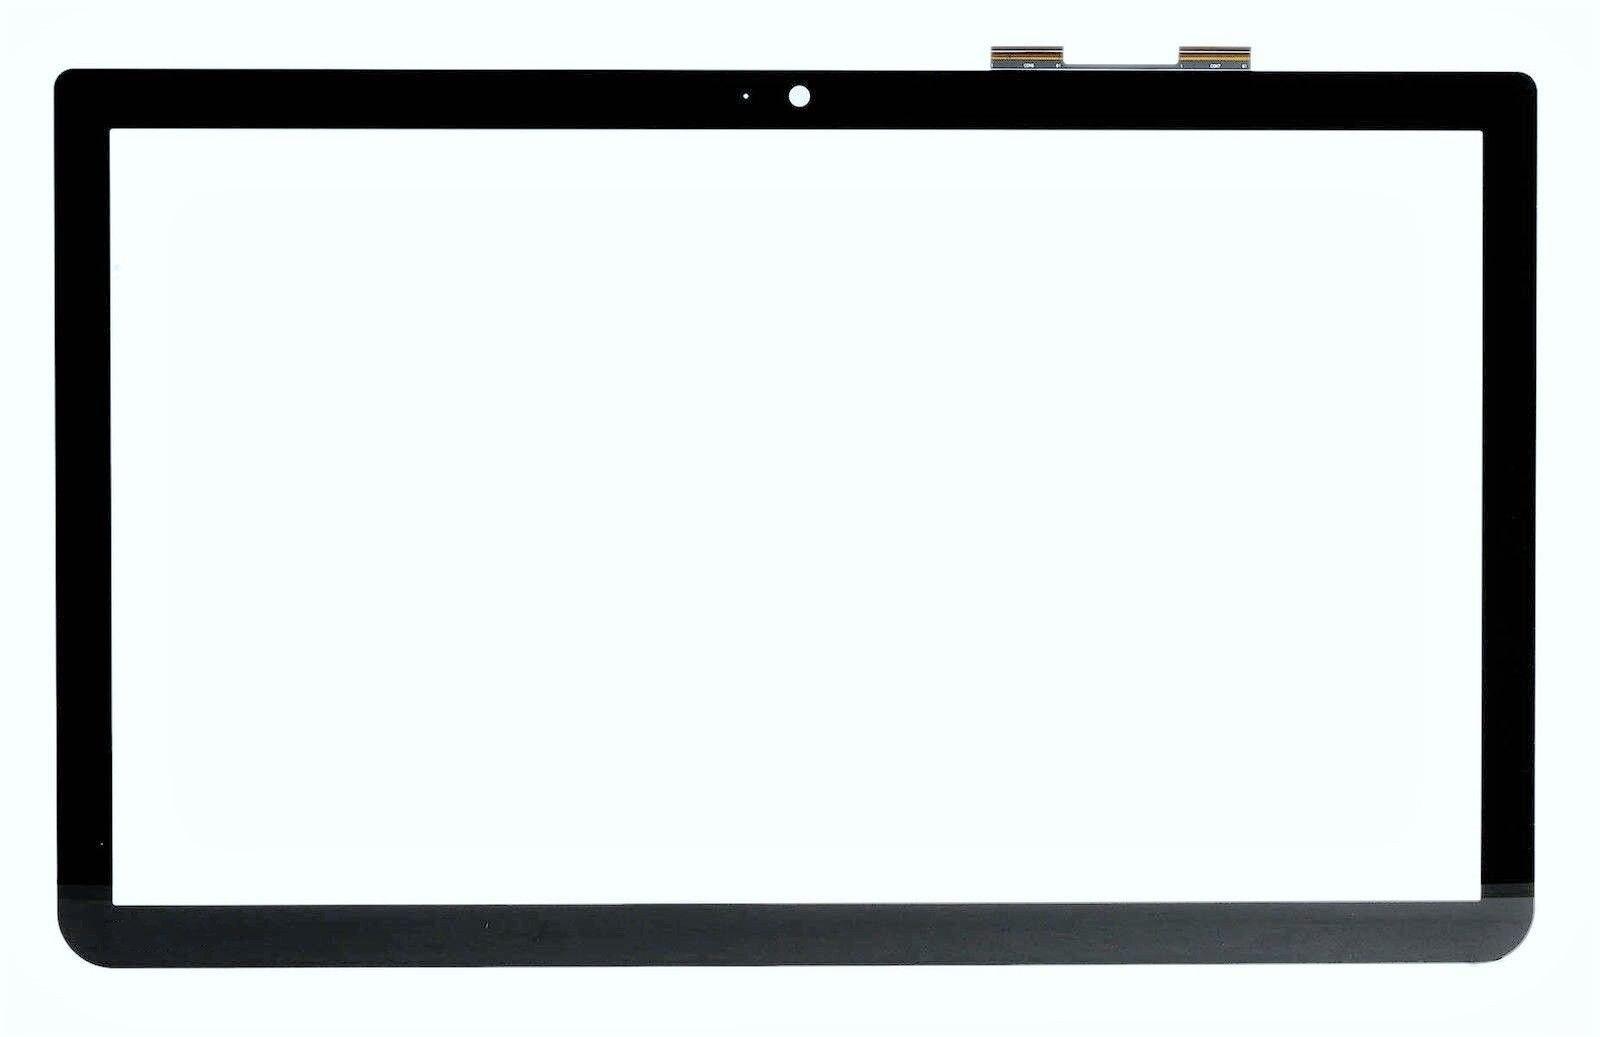 15.6 NEW Touch Screen Glass+Digitizer For Toshiba C55T-B5109 B5286 B5380 B5230  15.6 NEW Touch Screen Glass+Digitizer For Toshiba C55T-B5109 B5286 B5380 B5230